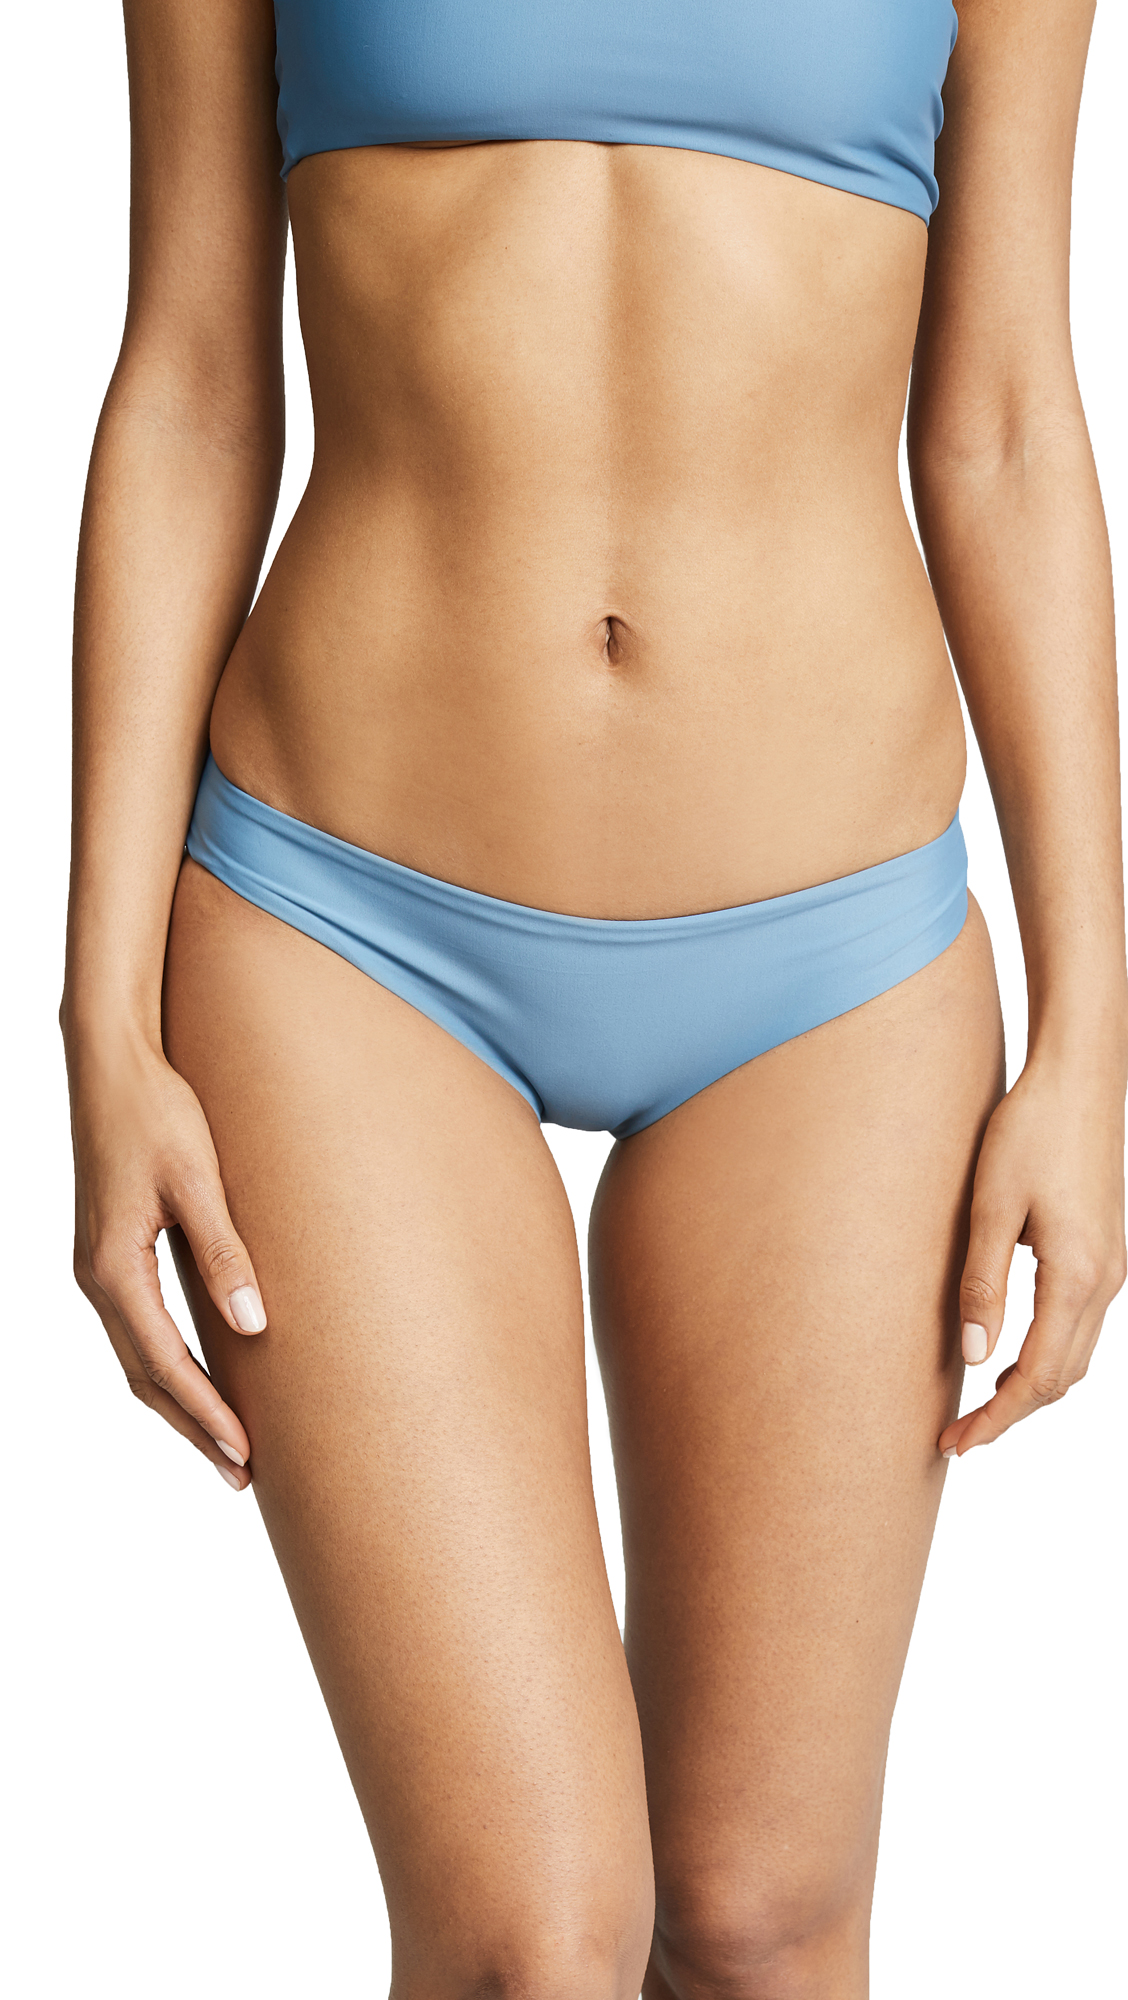 JADE Swim Lure Bikini Bottoms In Sky